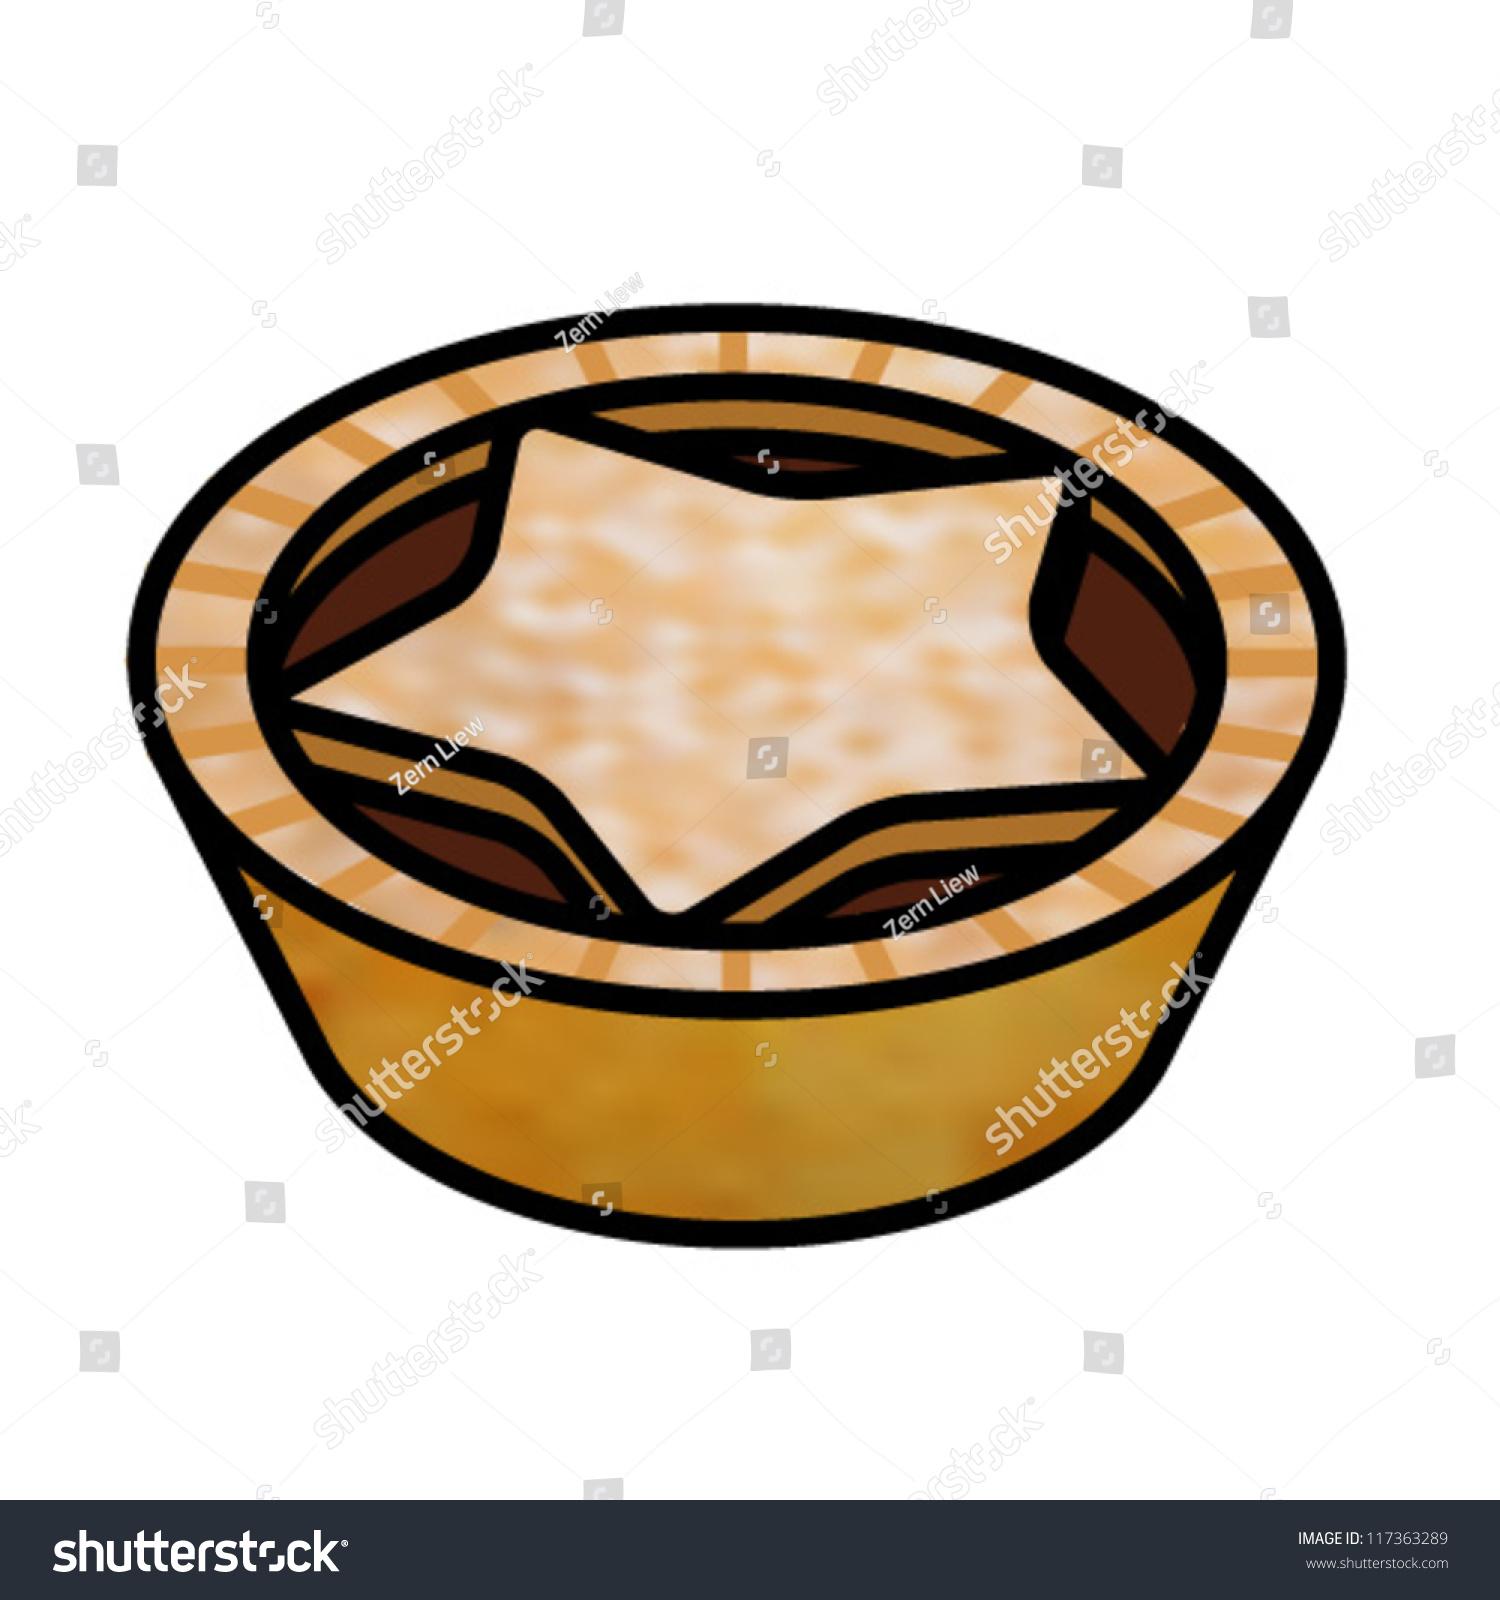 mince pie stock vector 117363289 shutterstock pot of gold clipart coloring sheet pot of gold clipart sheet